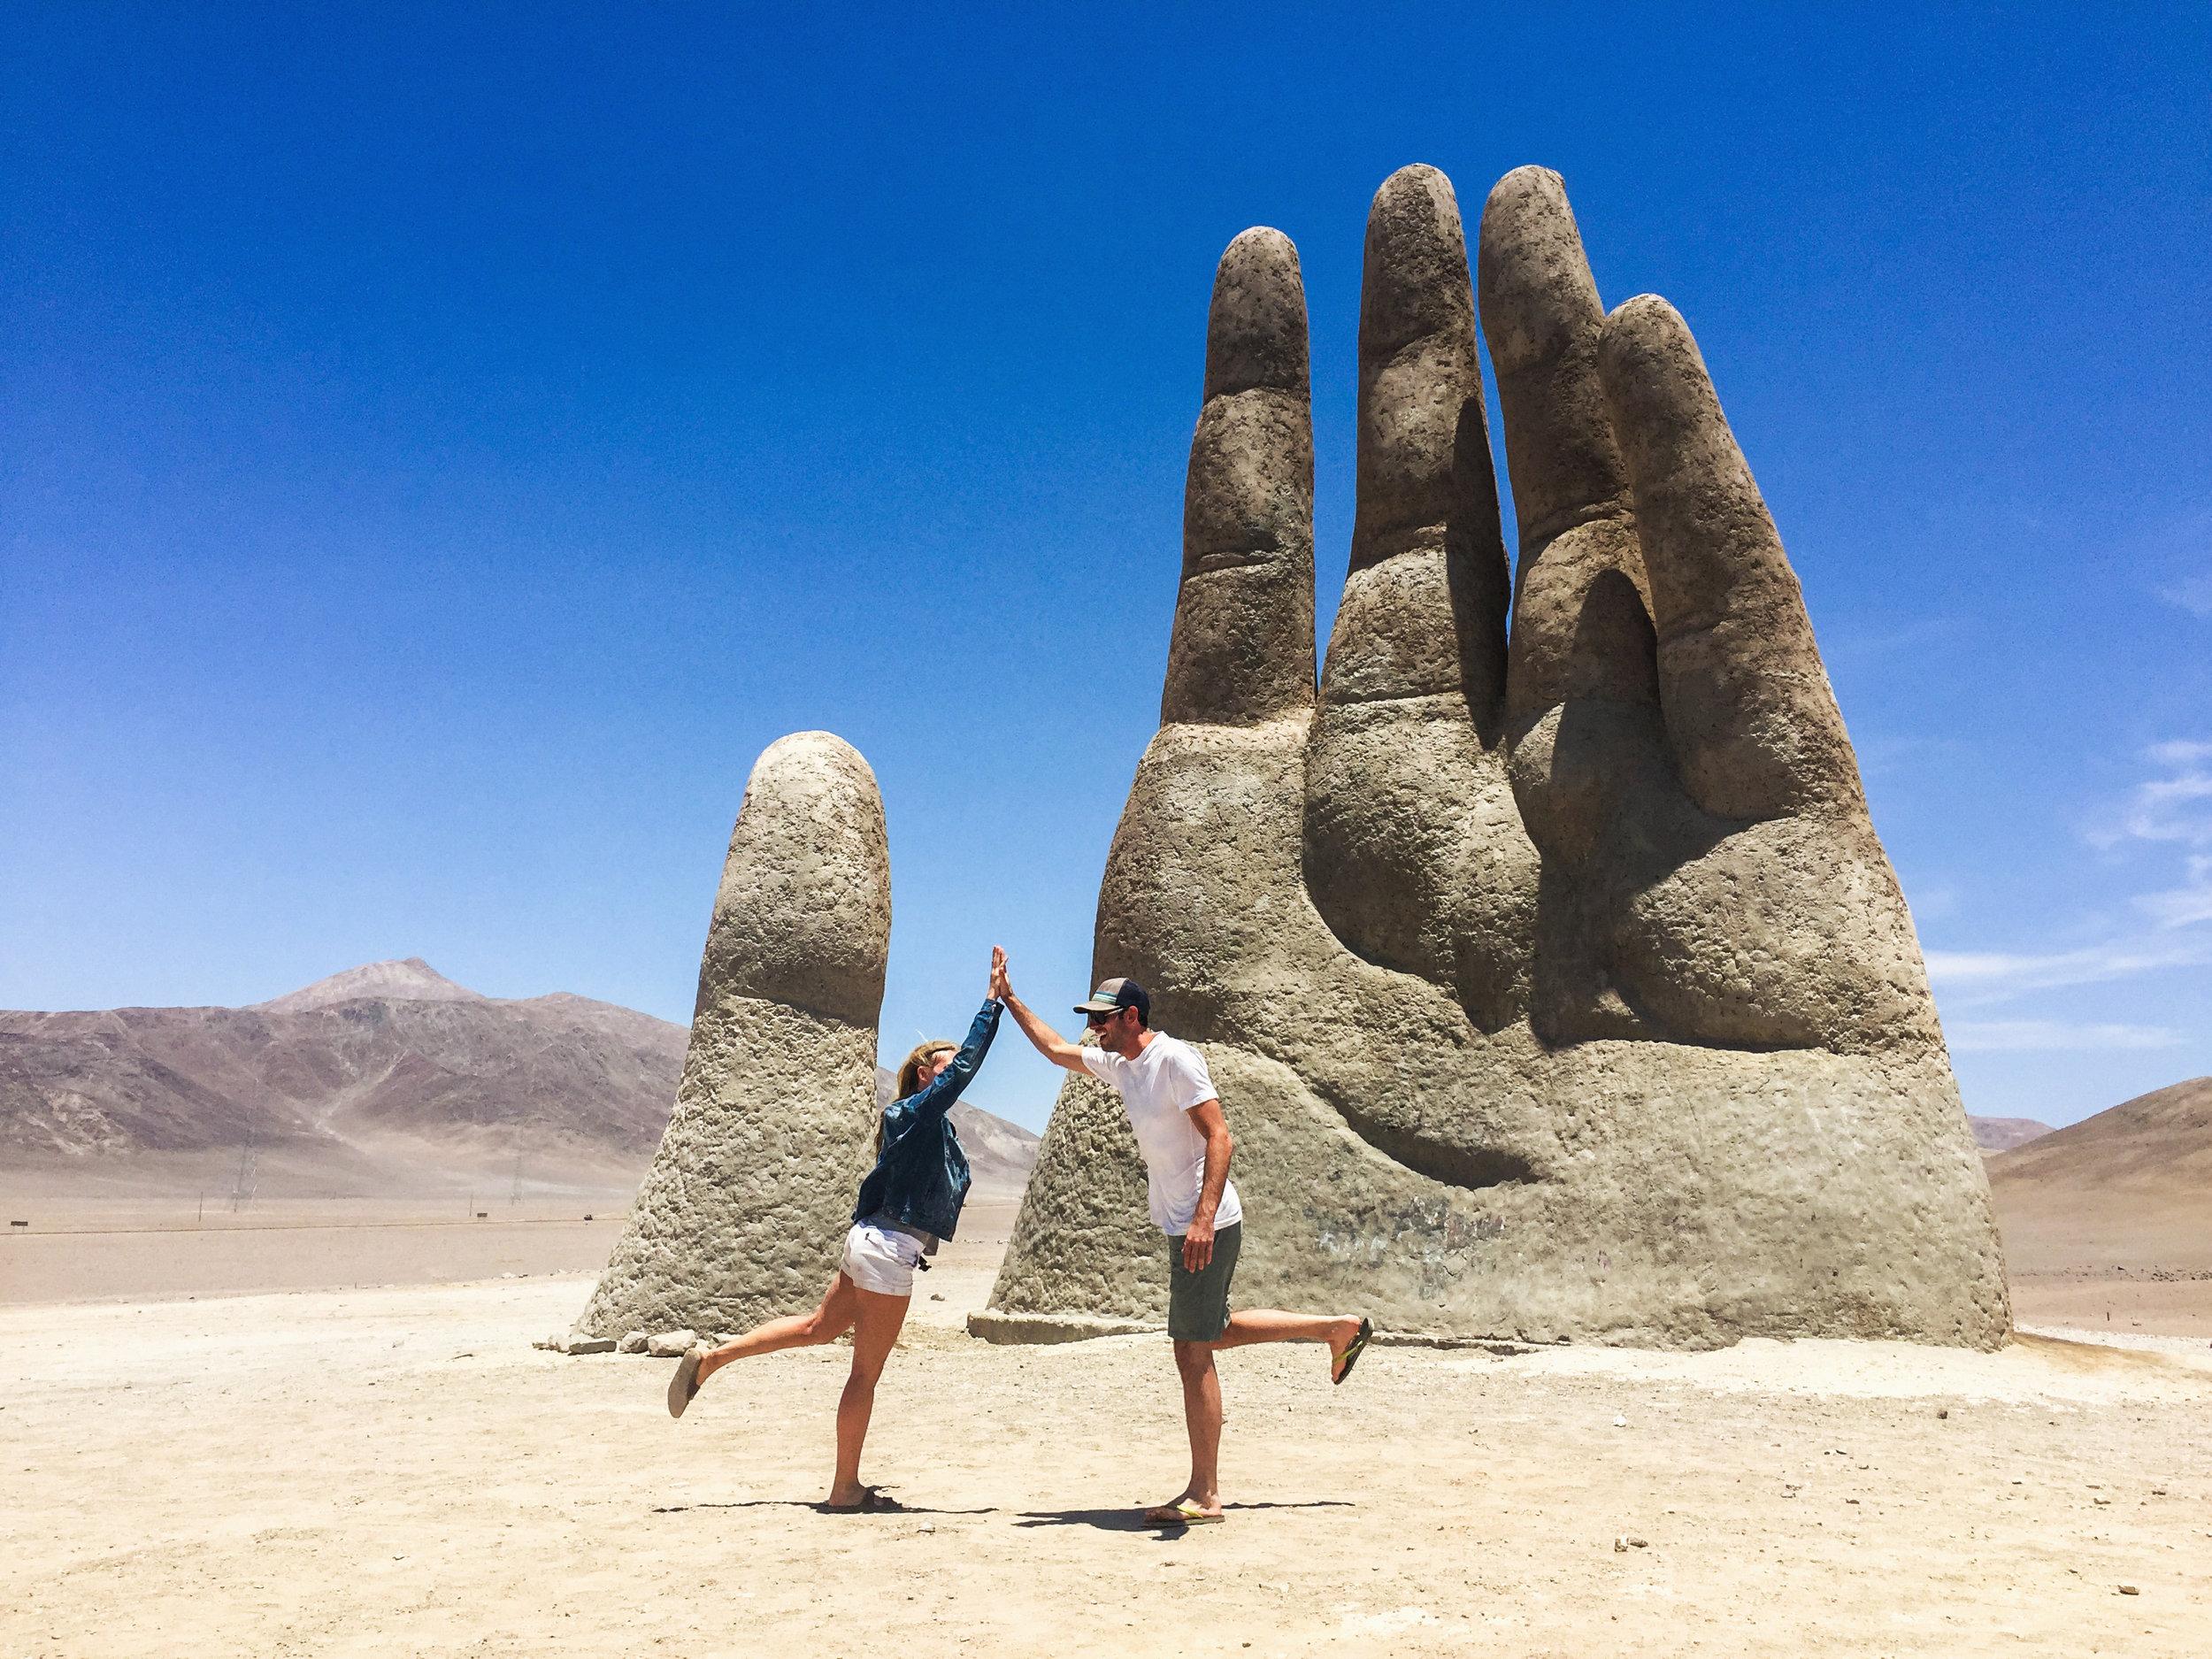 hand-of-the-desert-chile-wander-south-hi-five-2.jpg